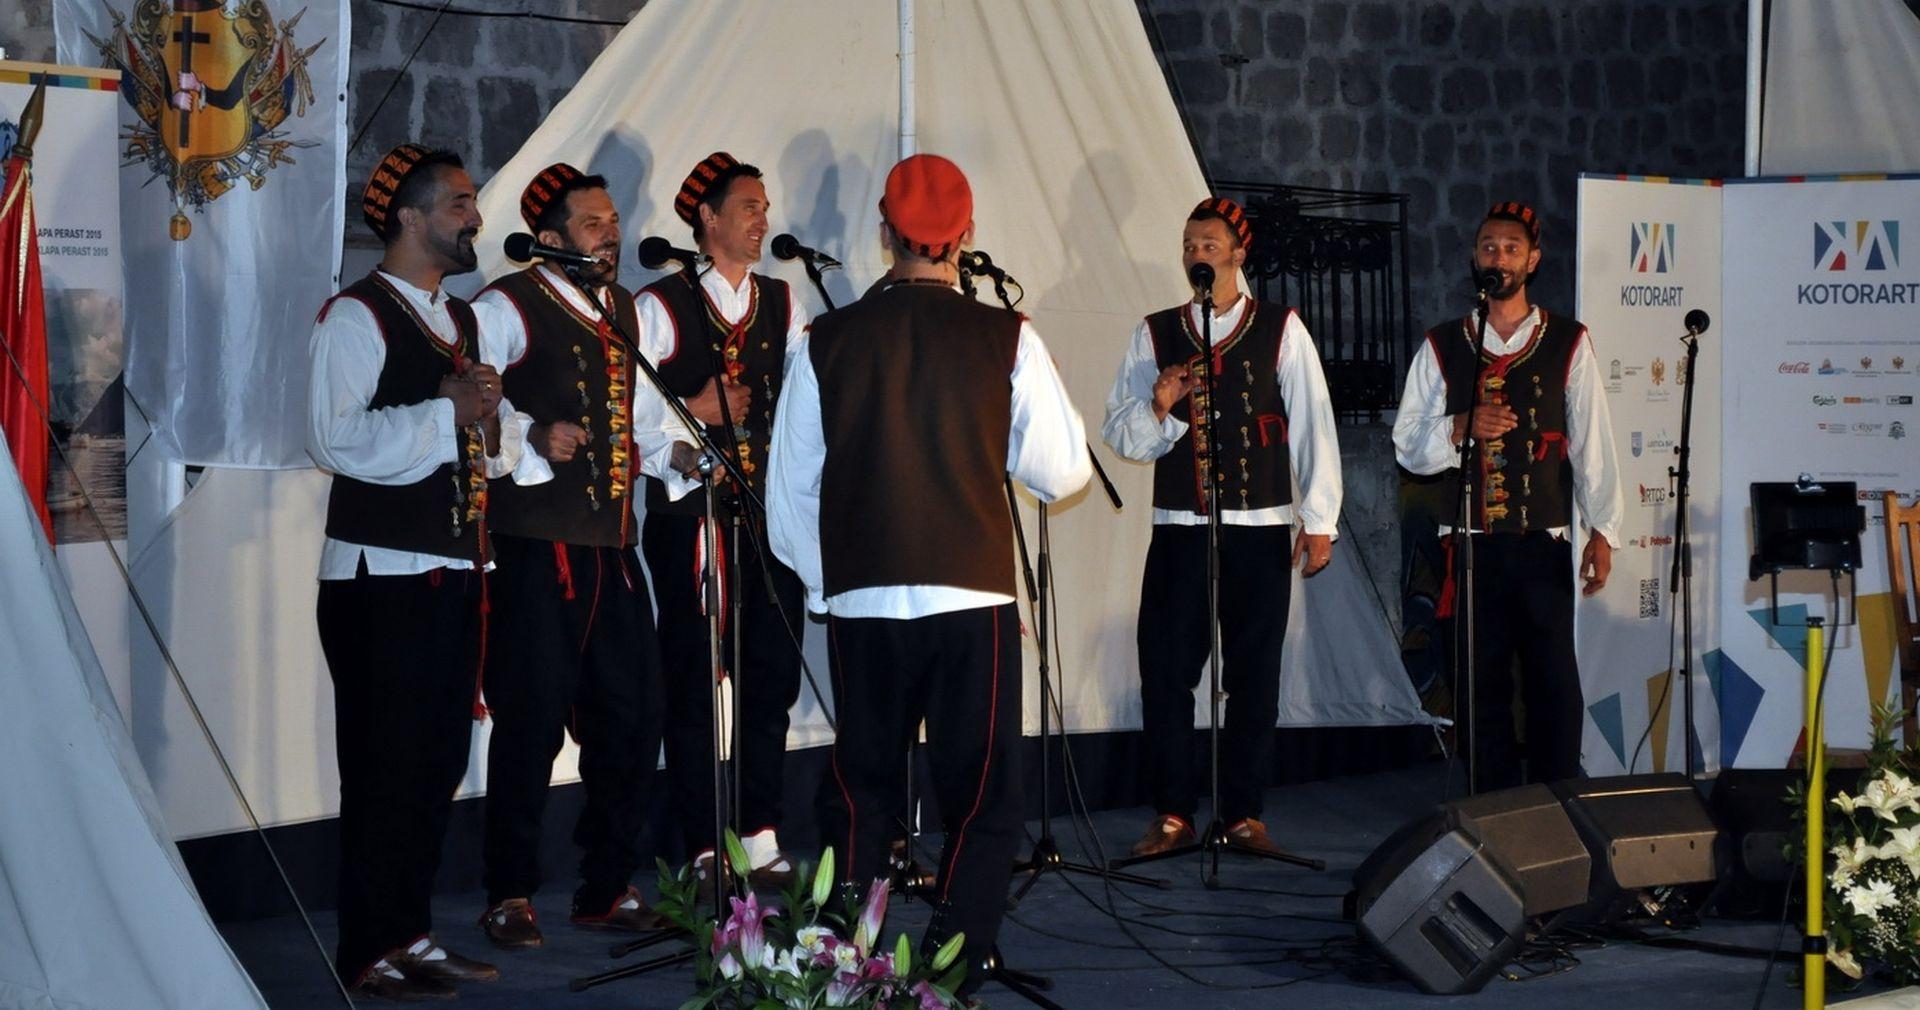 Klapa Bošket iz Zagreba pobjednik festivala u Posušju